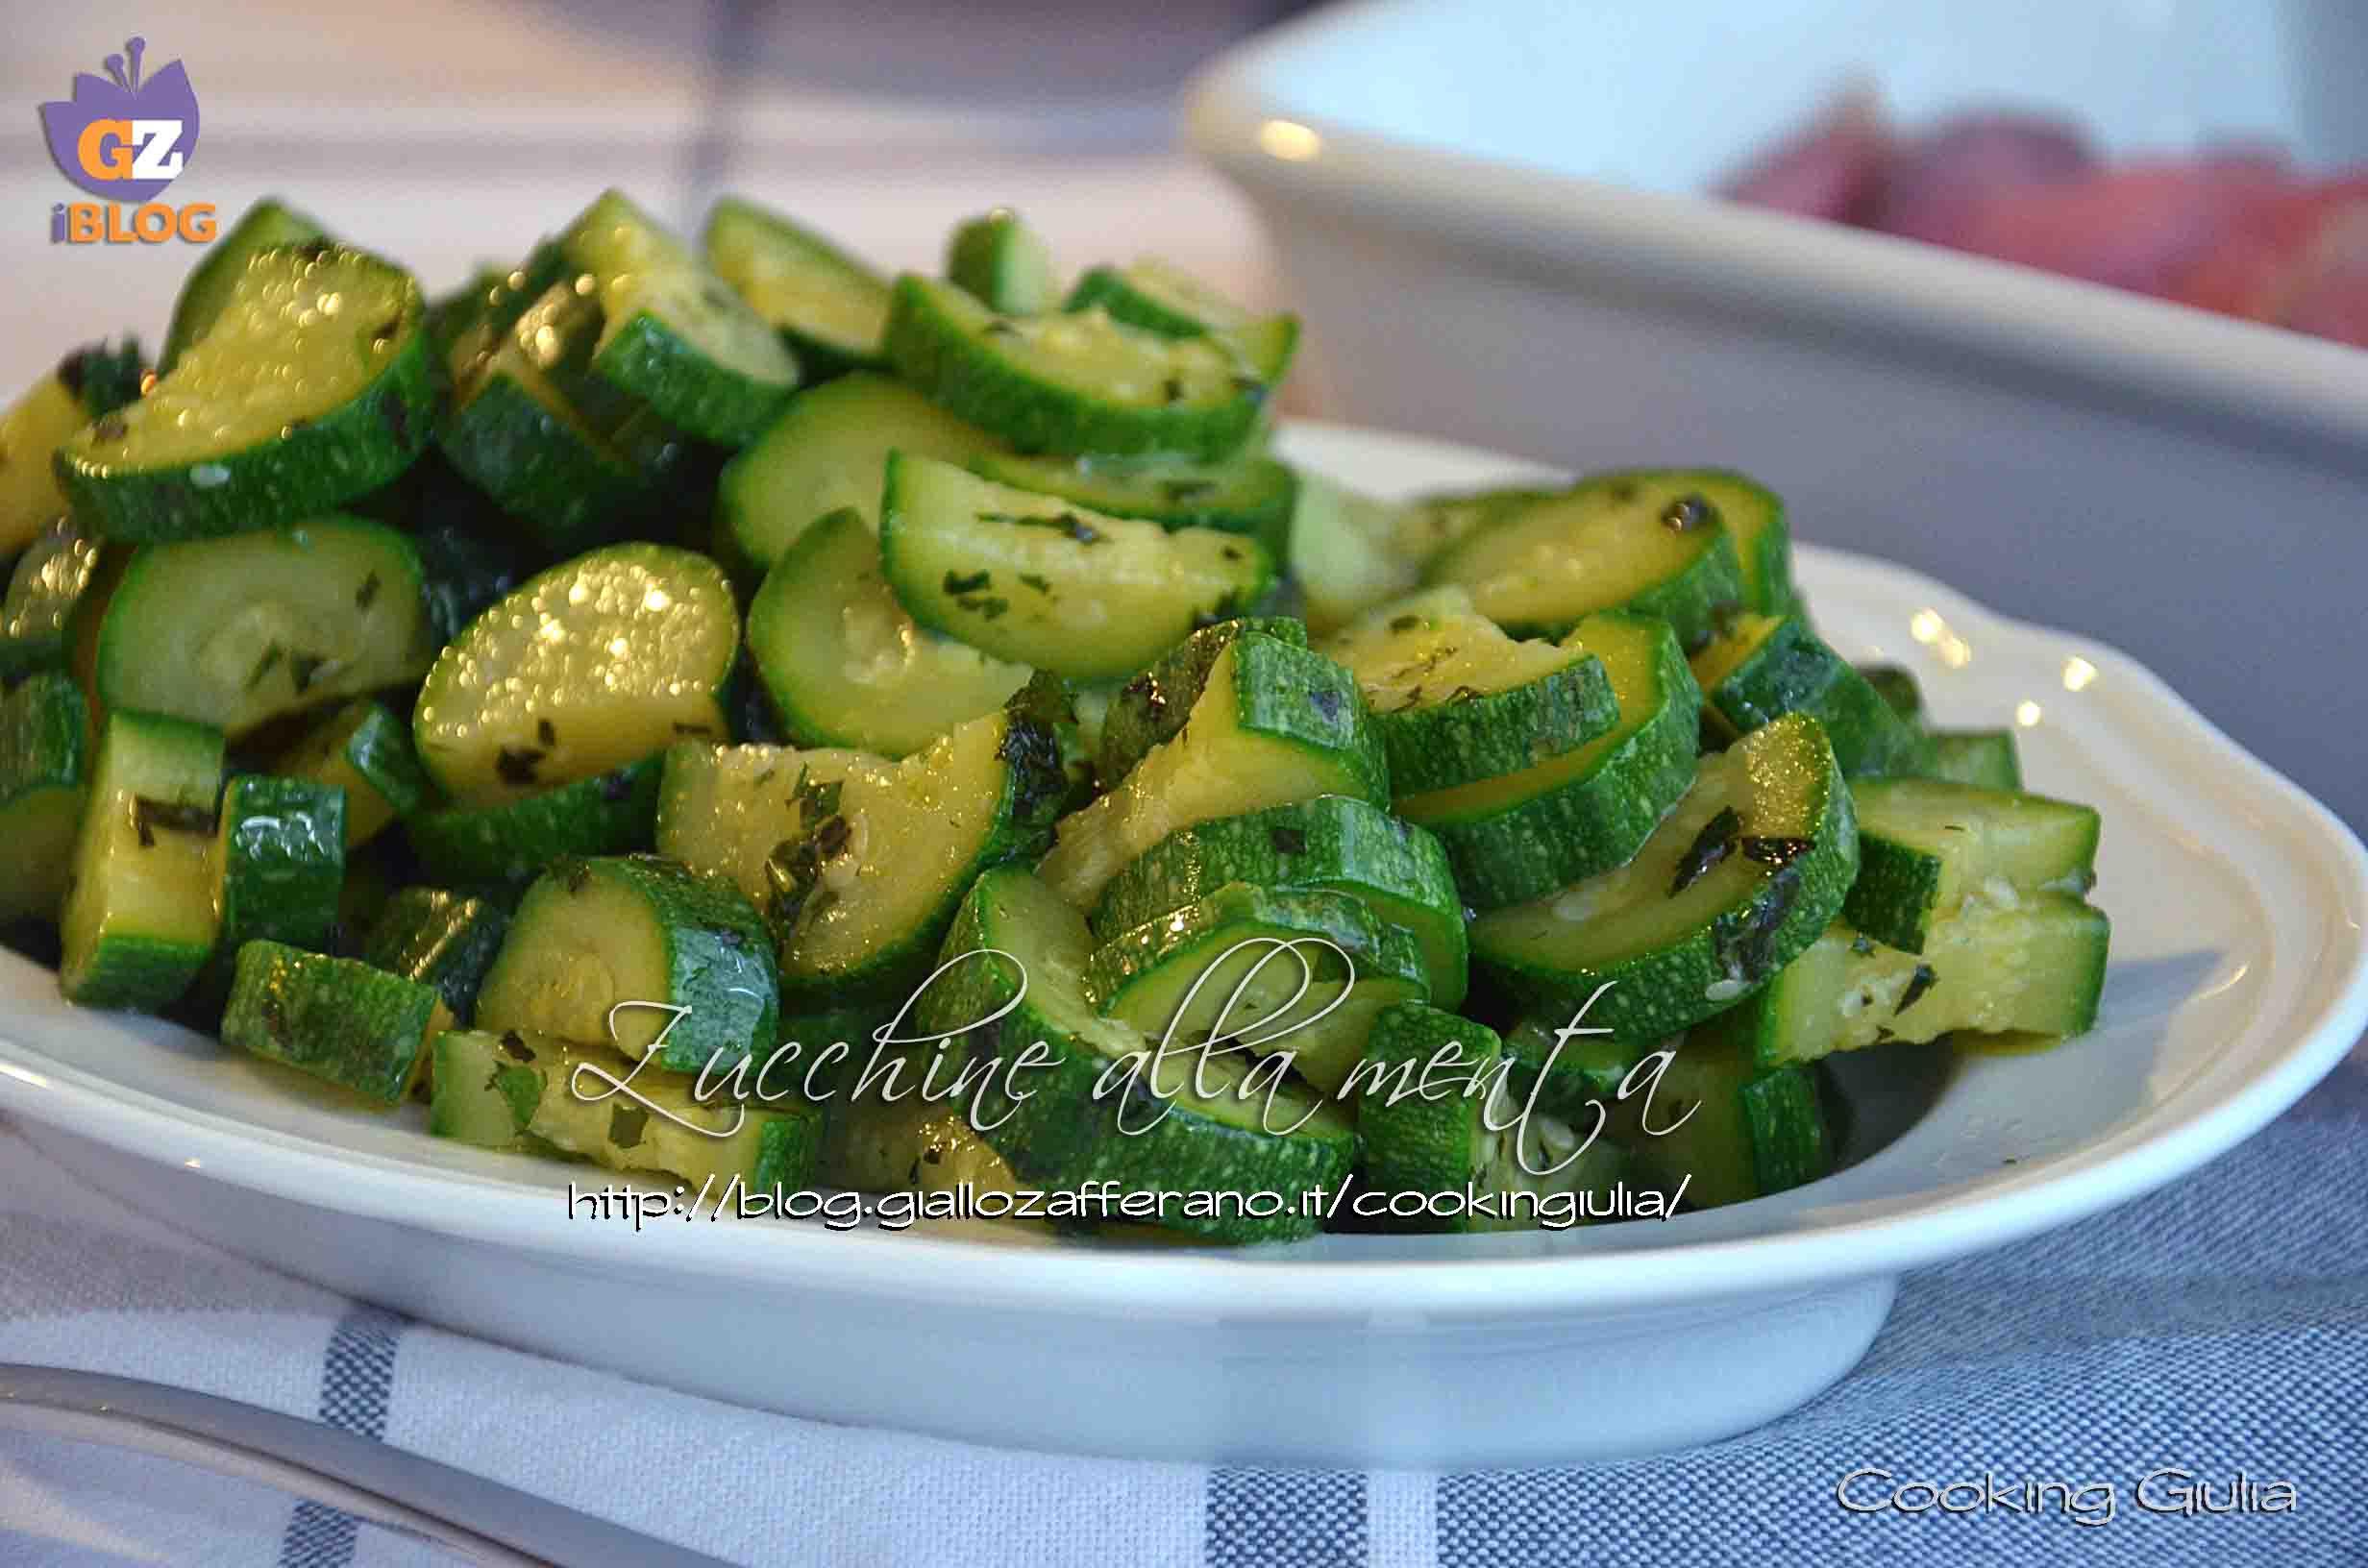 Ricetta Zucchine Bollite.Zucchine Alla Menta Ricetta Vegetariana Contorno Fresco Ed Estivo